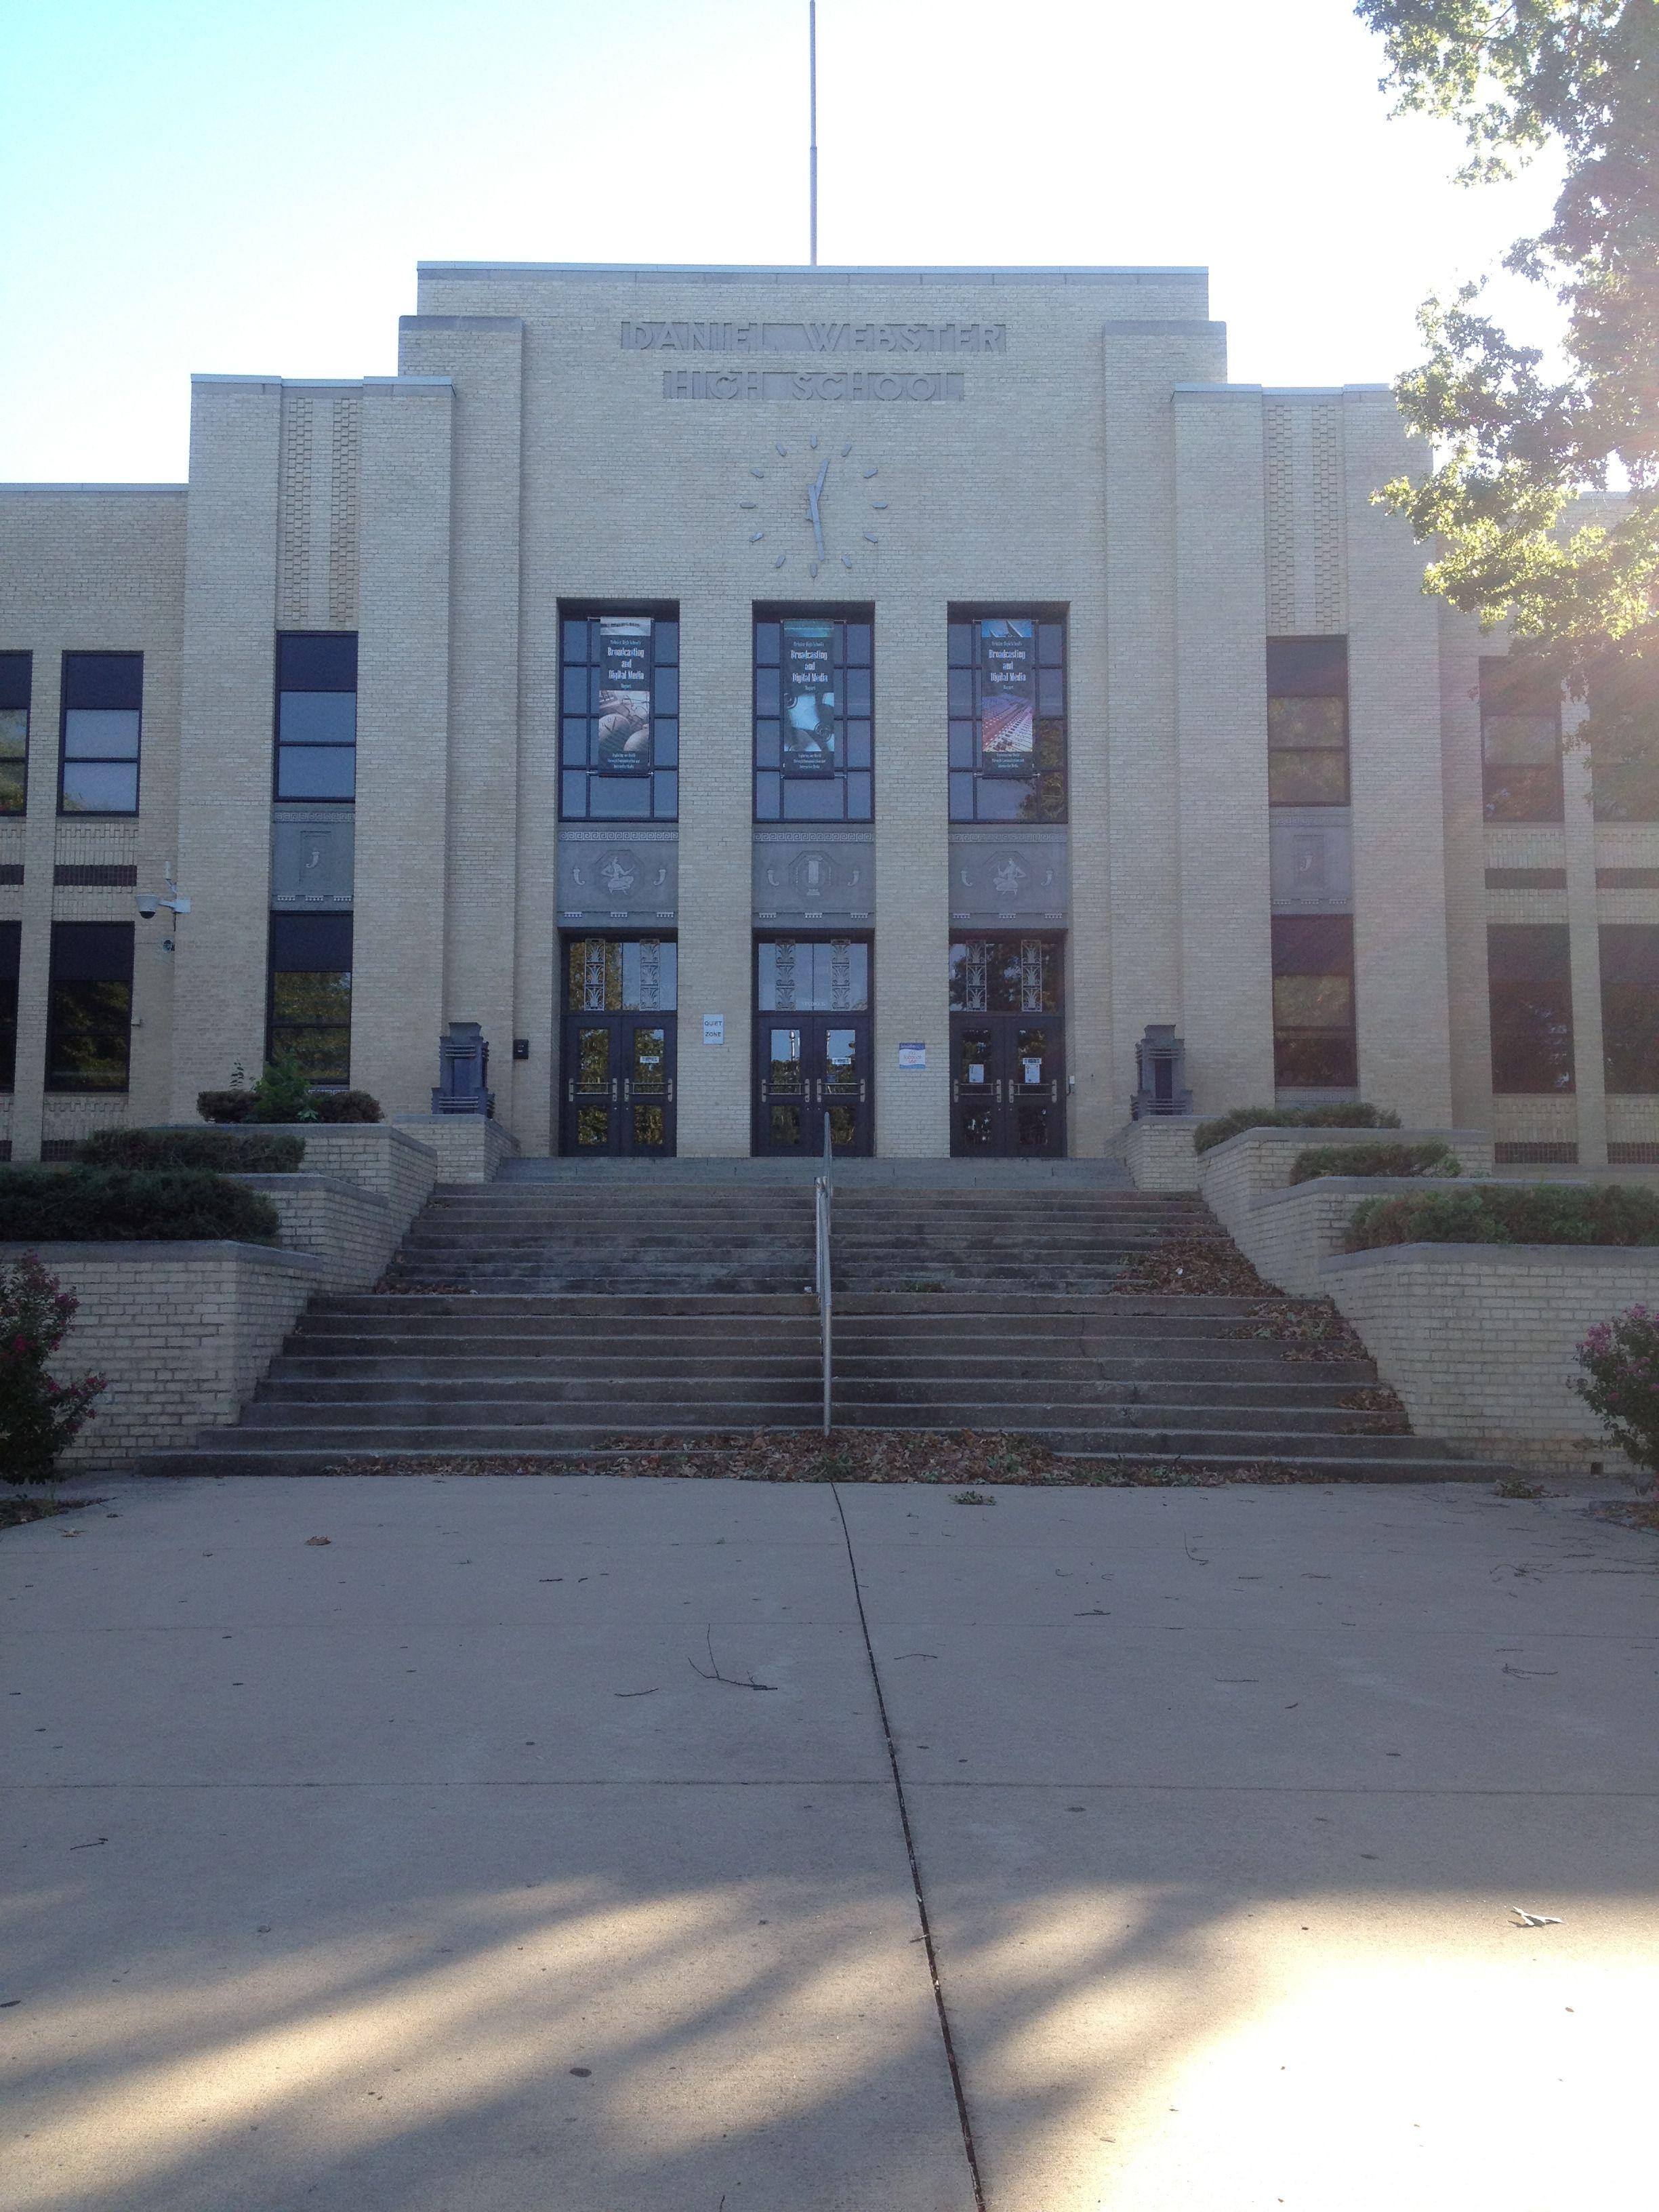 Daniel Webster High School Tulsa Ok Where My Sister In Law